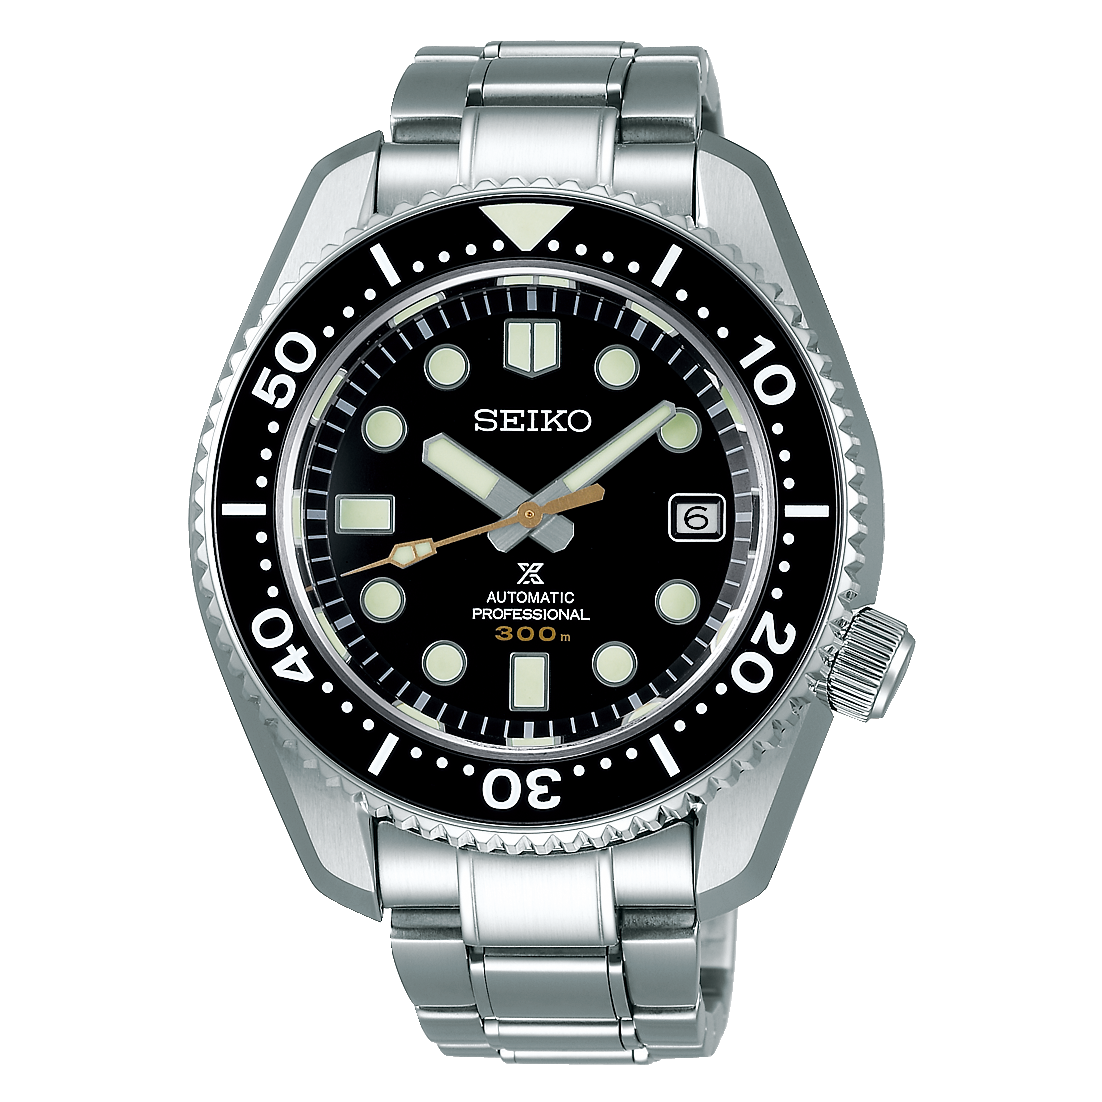 SBDX023